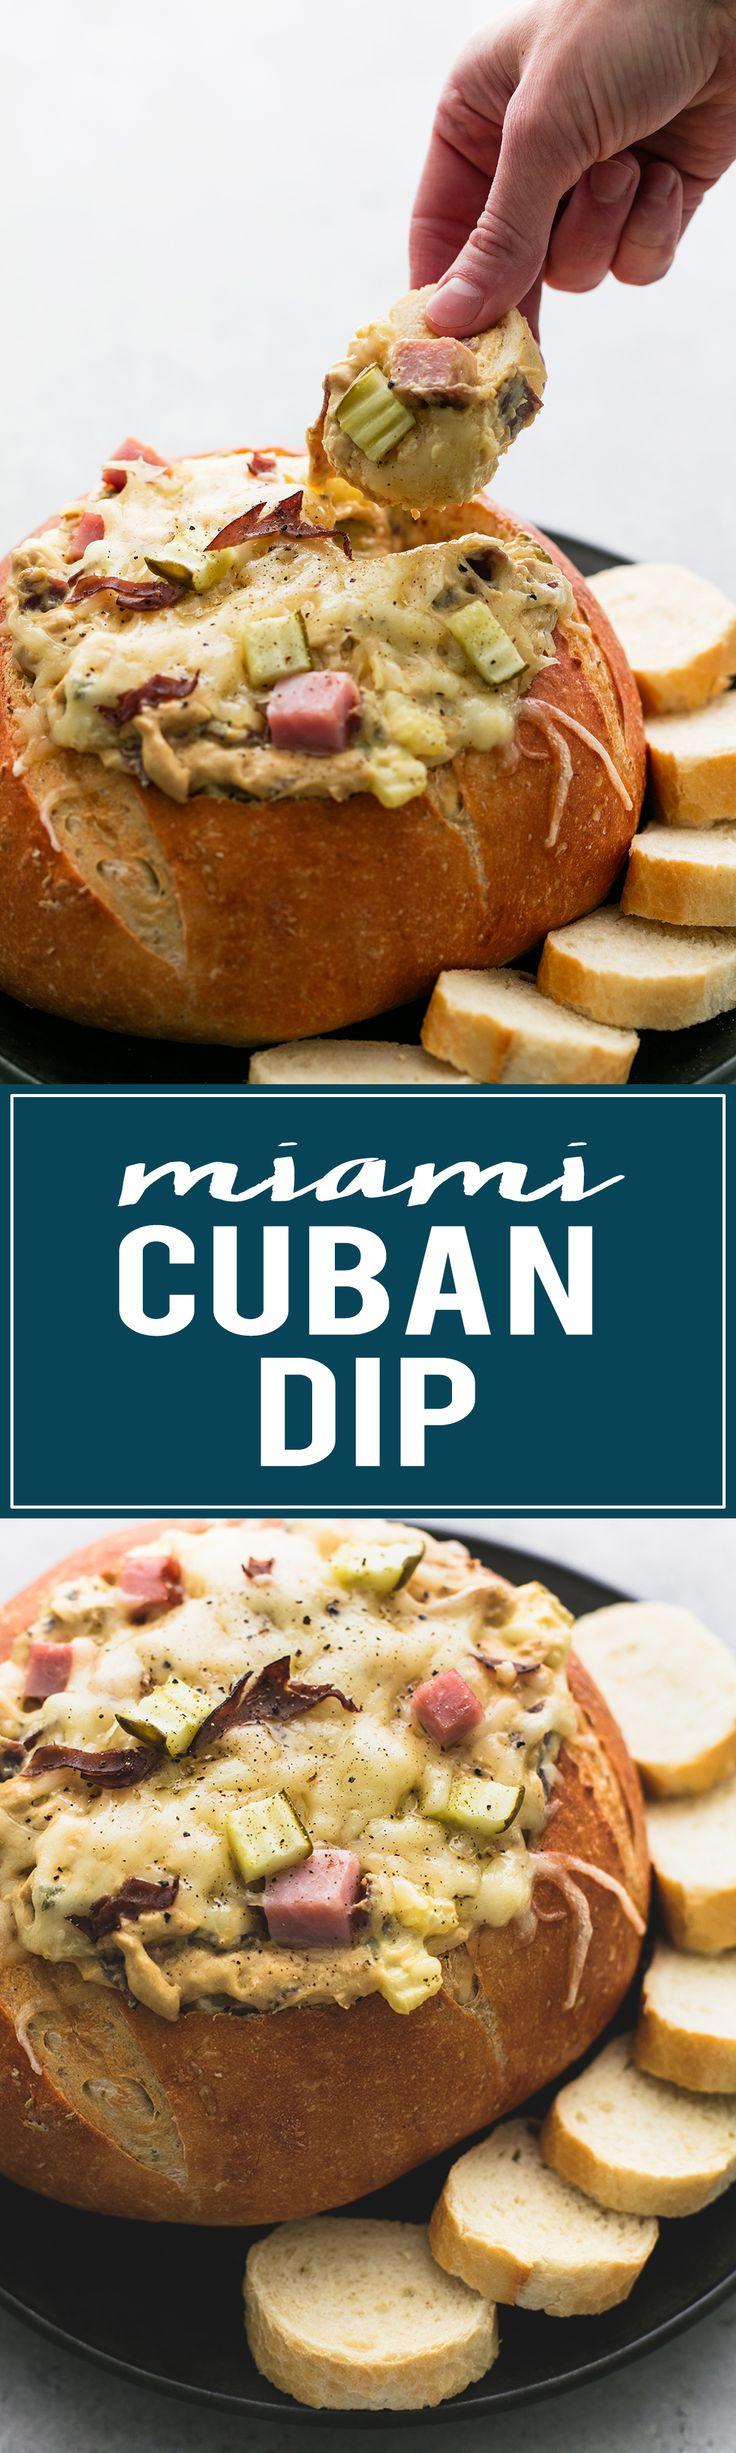 Miami Cuban Dip - a cheesy, dippable twist on the famous Cuban sandwich!   lecremedelacrumb.com